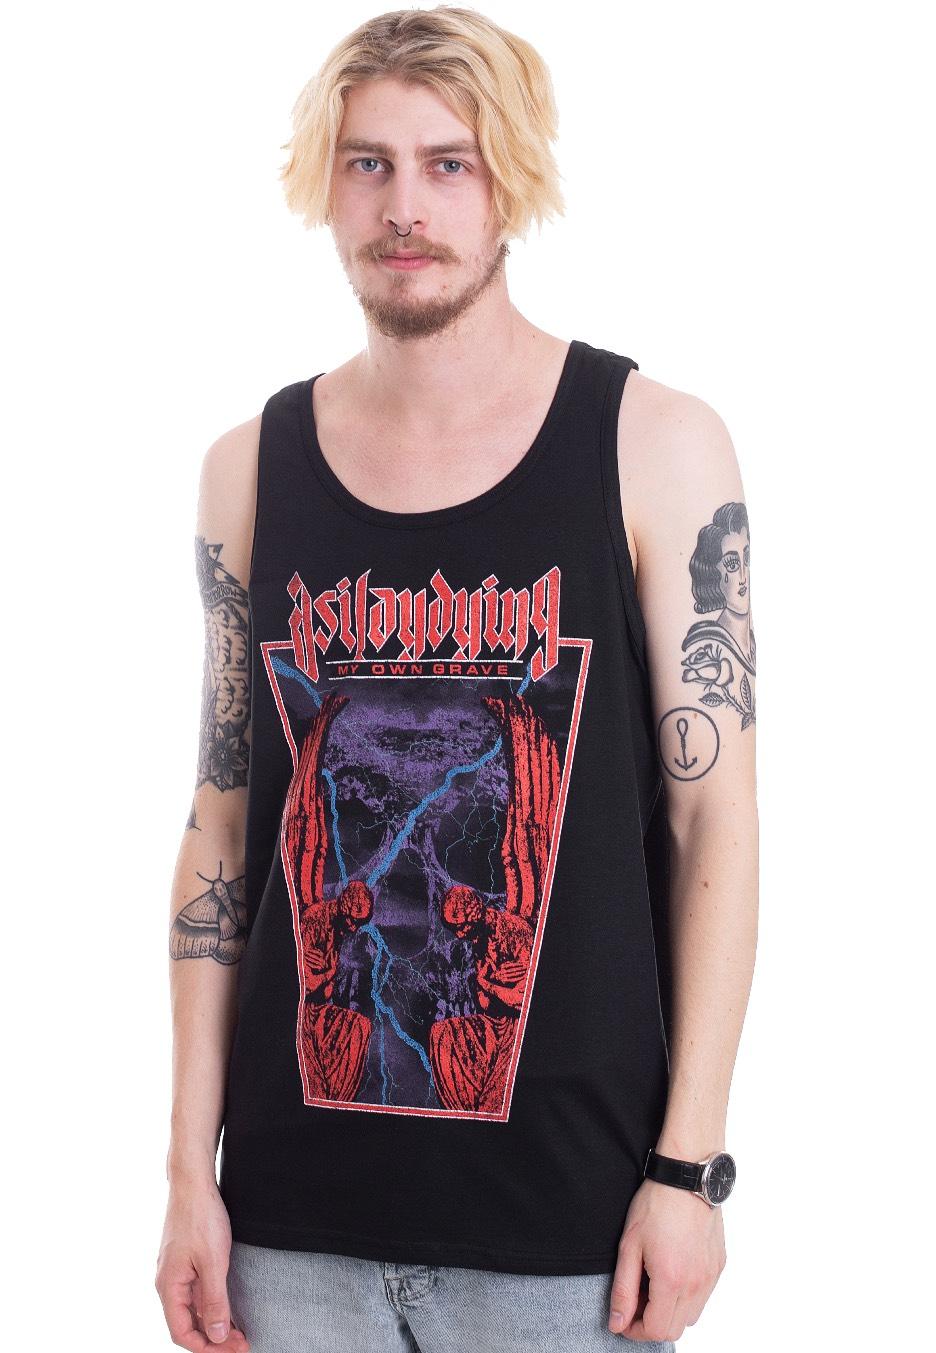 Emmure Brimstone T Shirt